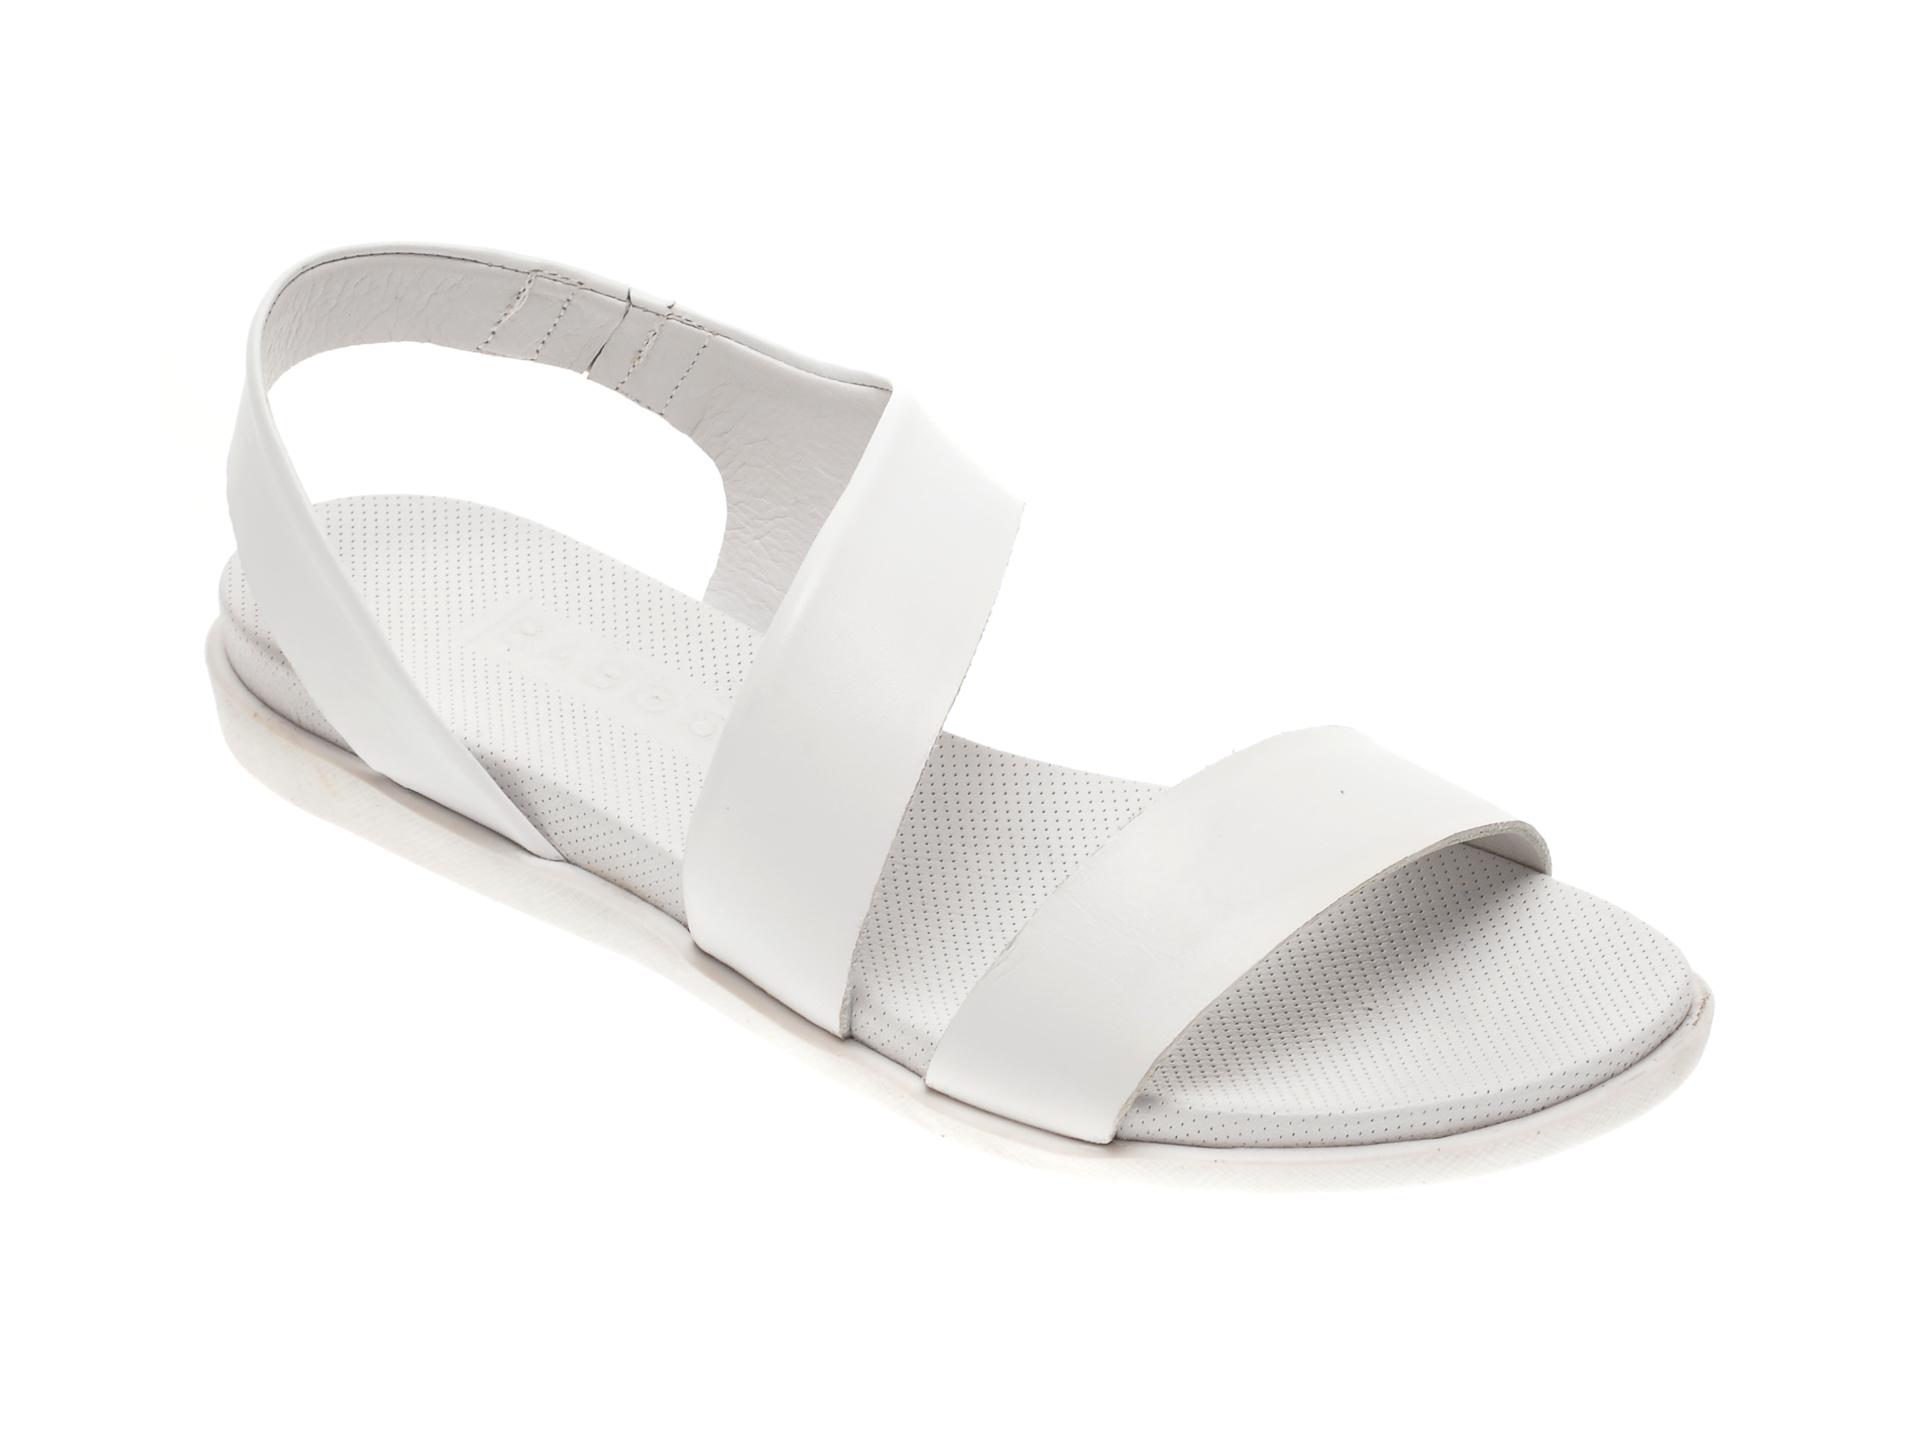 Sandale BABOOS albe, 1402, din piele naturala imagine